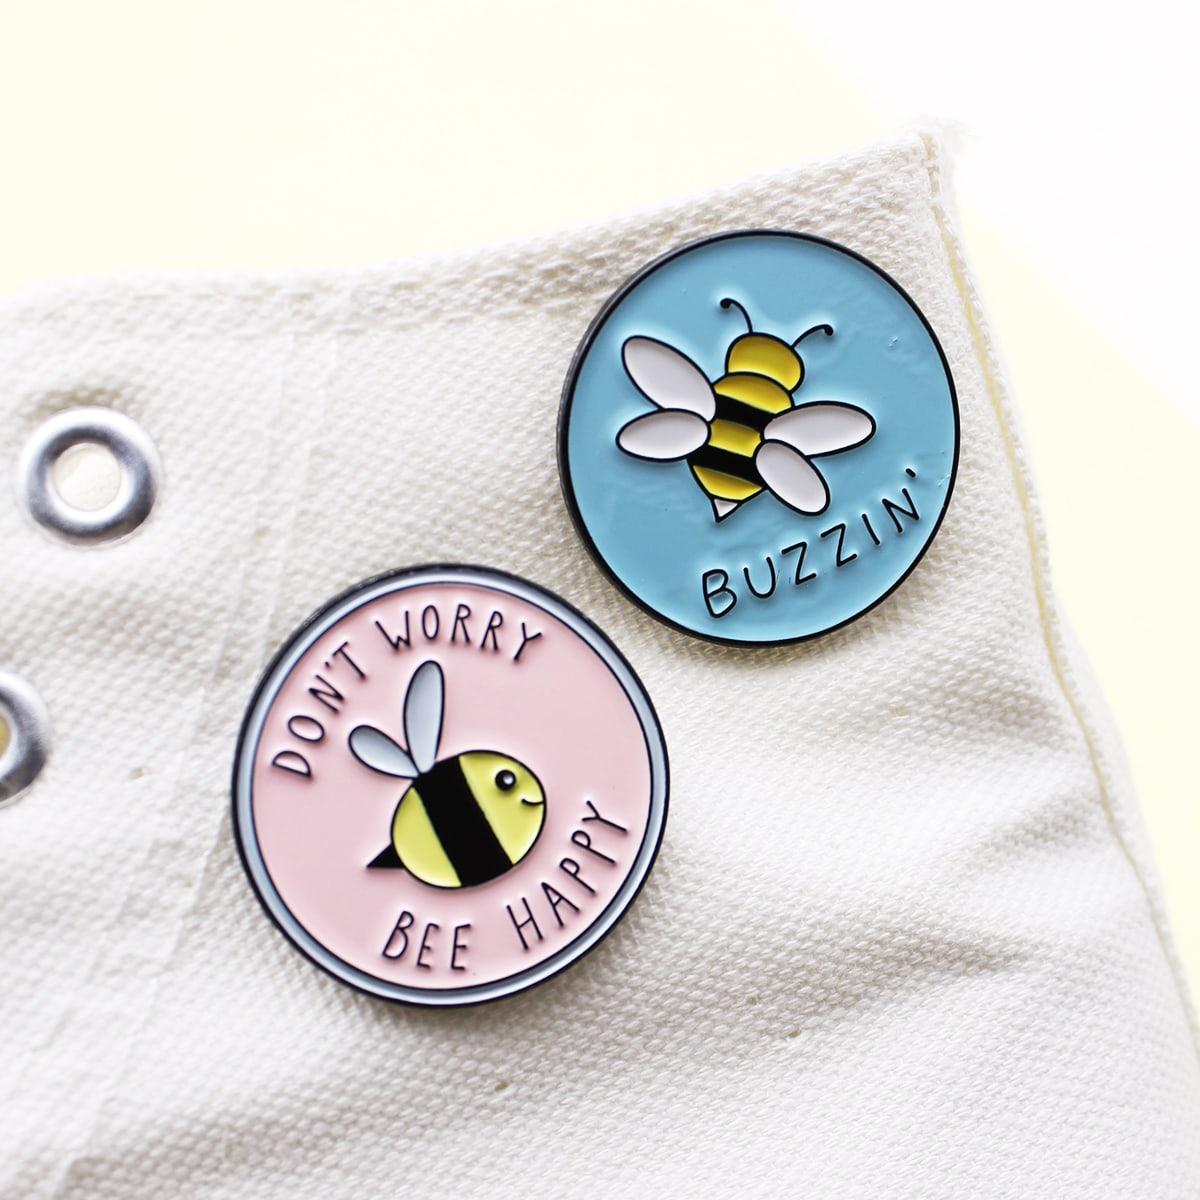 2шт брошь с рисунком пчелы фото